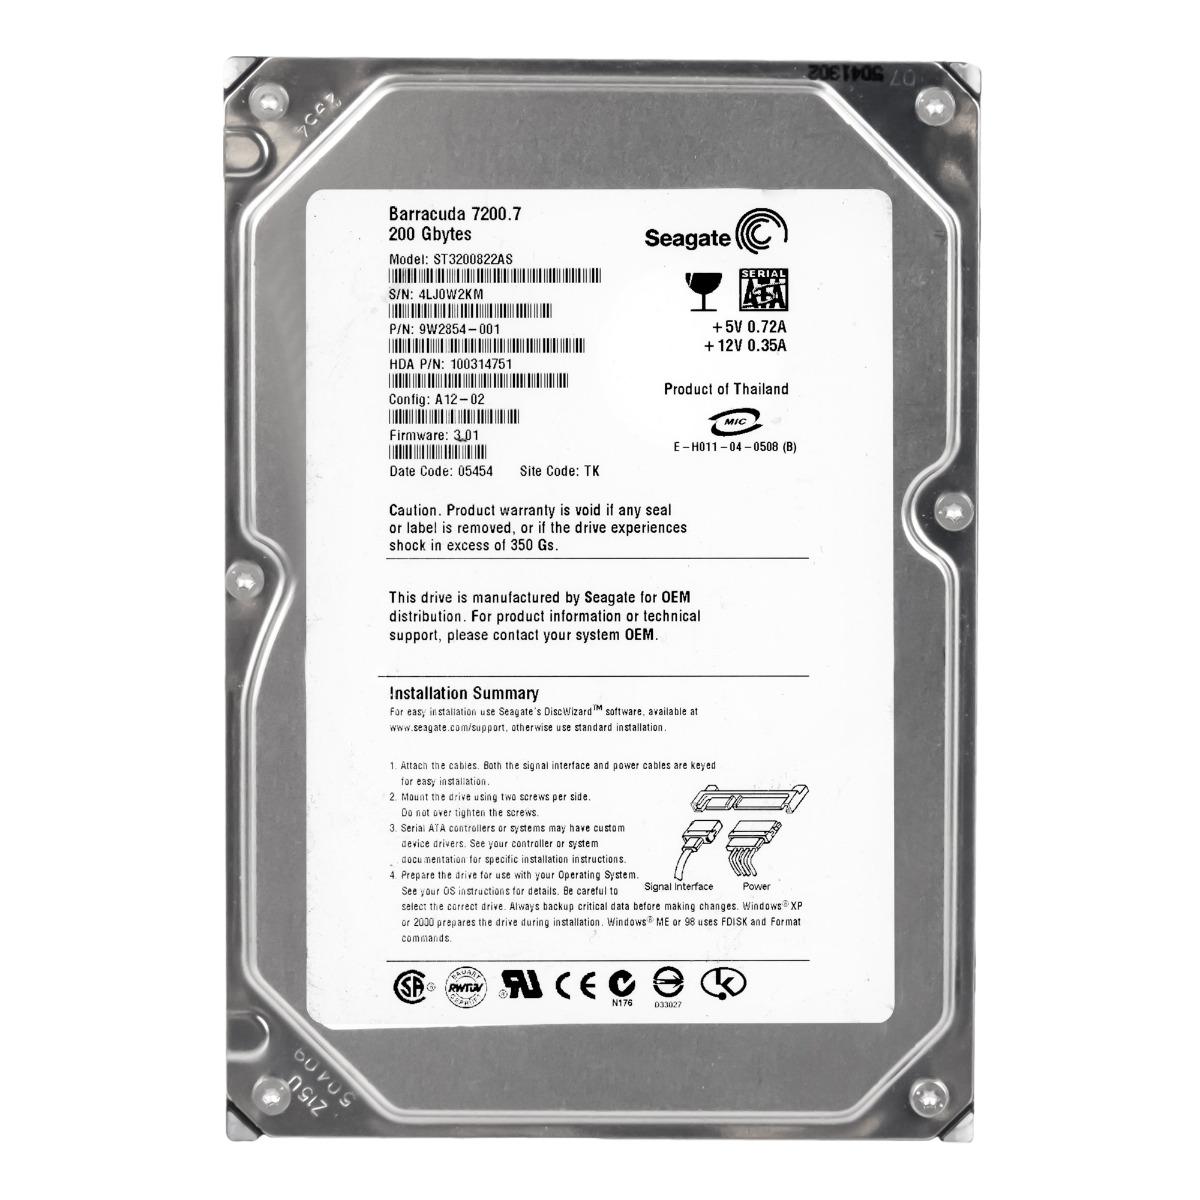 "Seagate Barracuda 7200.7 200 GB Hard Drive 3.5/"" SATA"